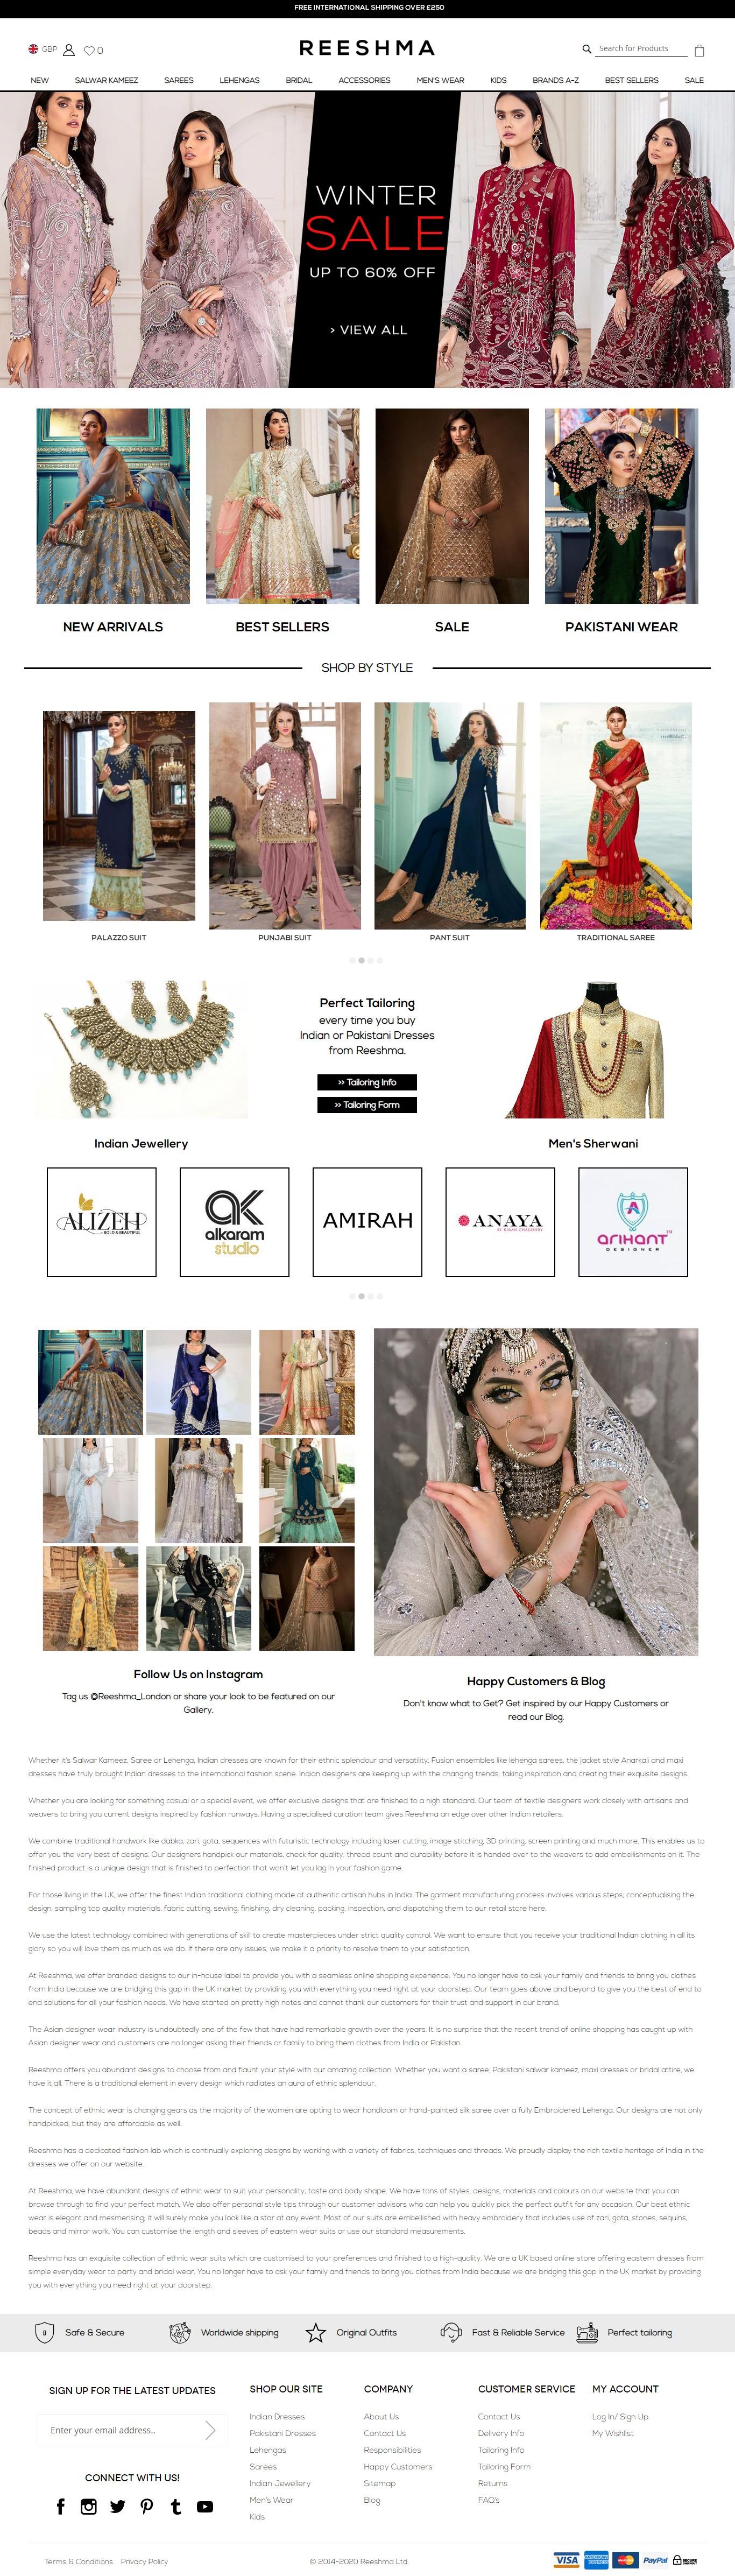 Buy Classic Indian Dresses & Asian Designer Wear Online